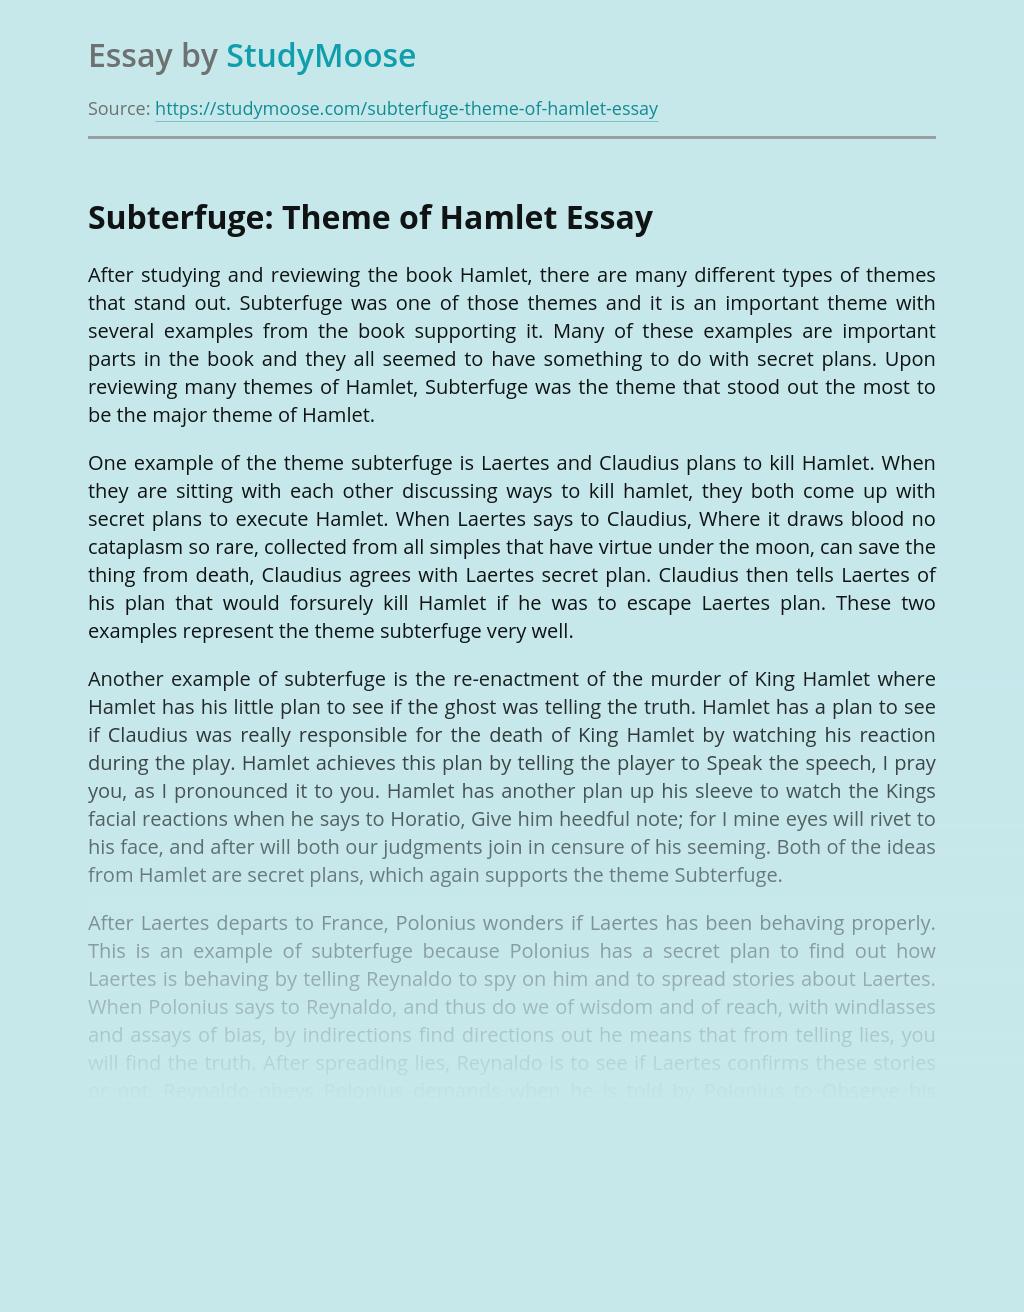 Subterfuge: Theme of Hamlet